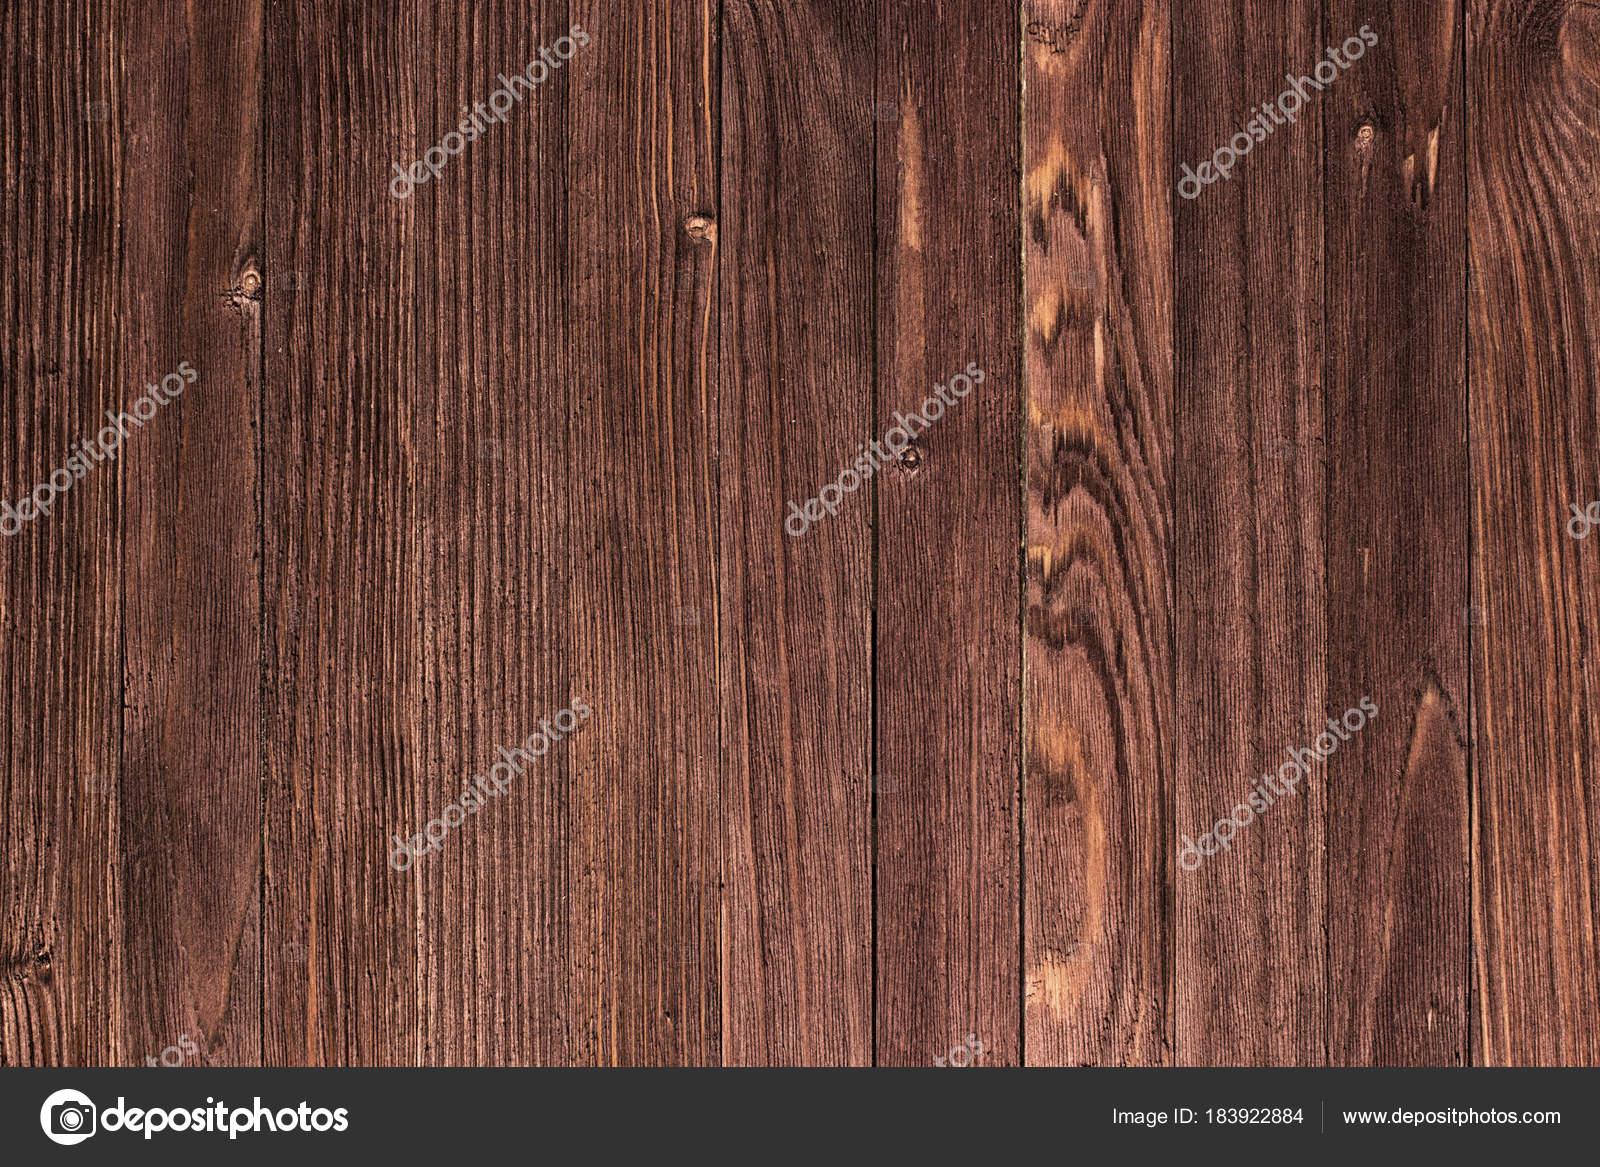 Ustic Plank Holz Diele Kulisse Mit Vignette Stockfoto C Dmitr1ch